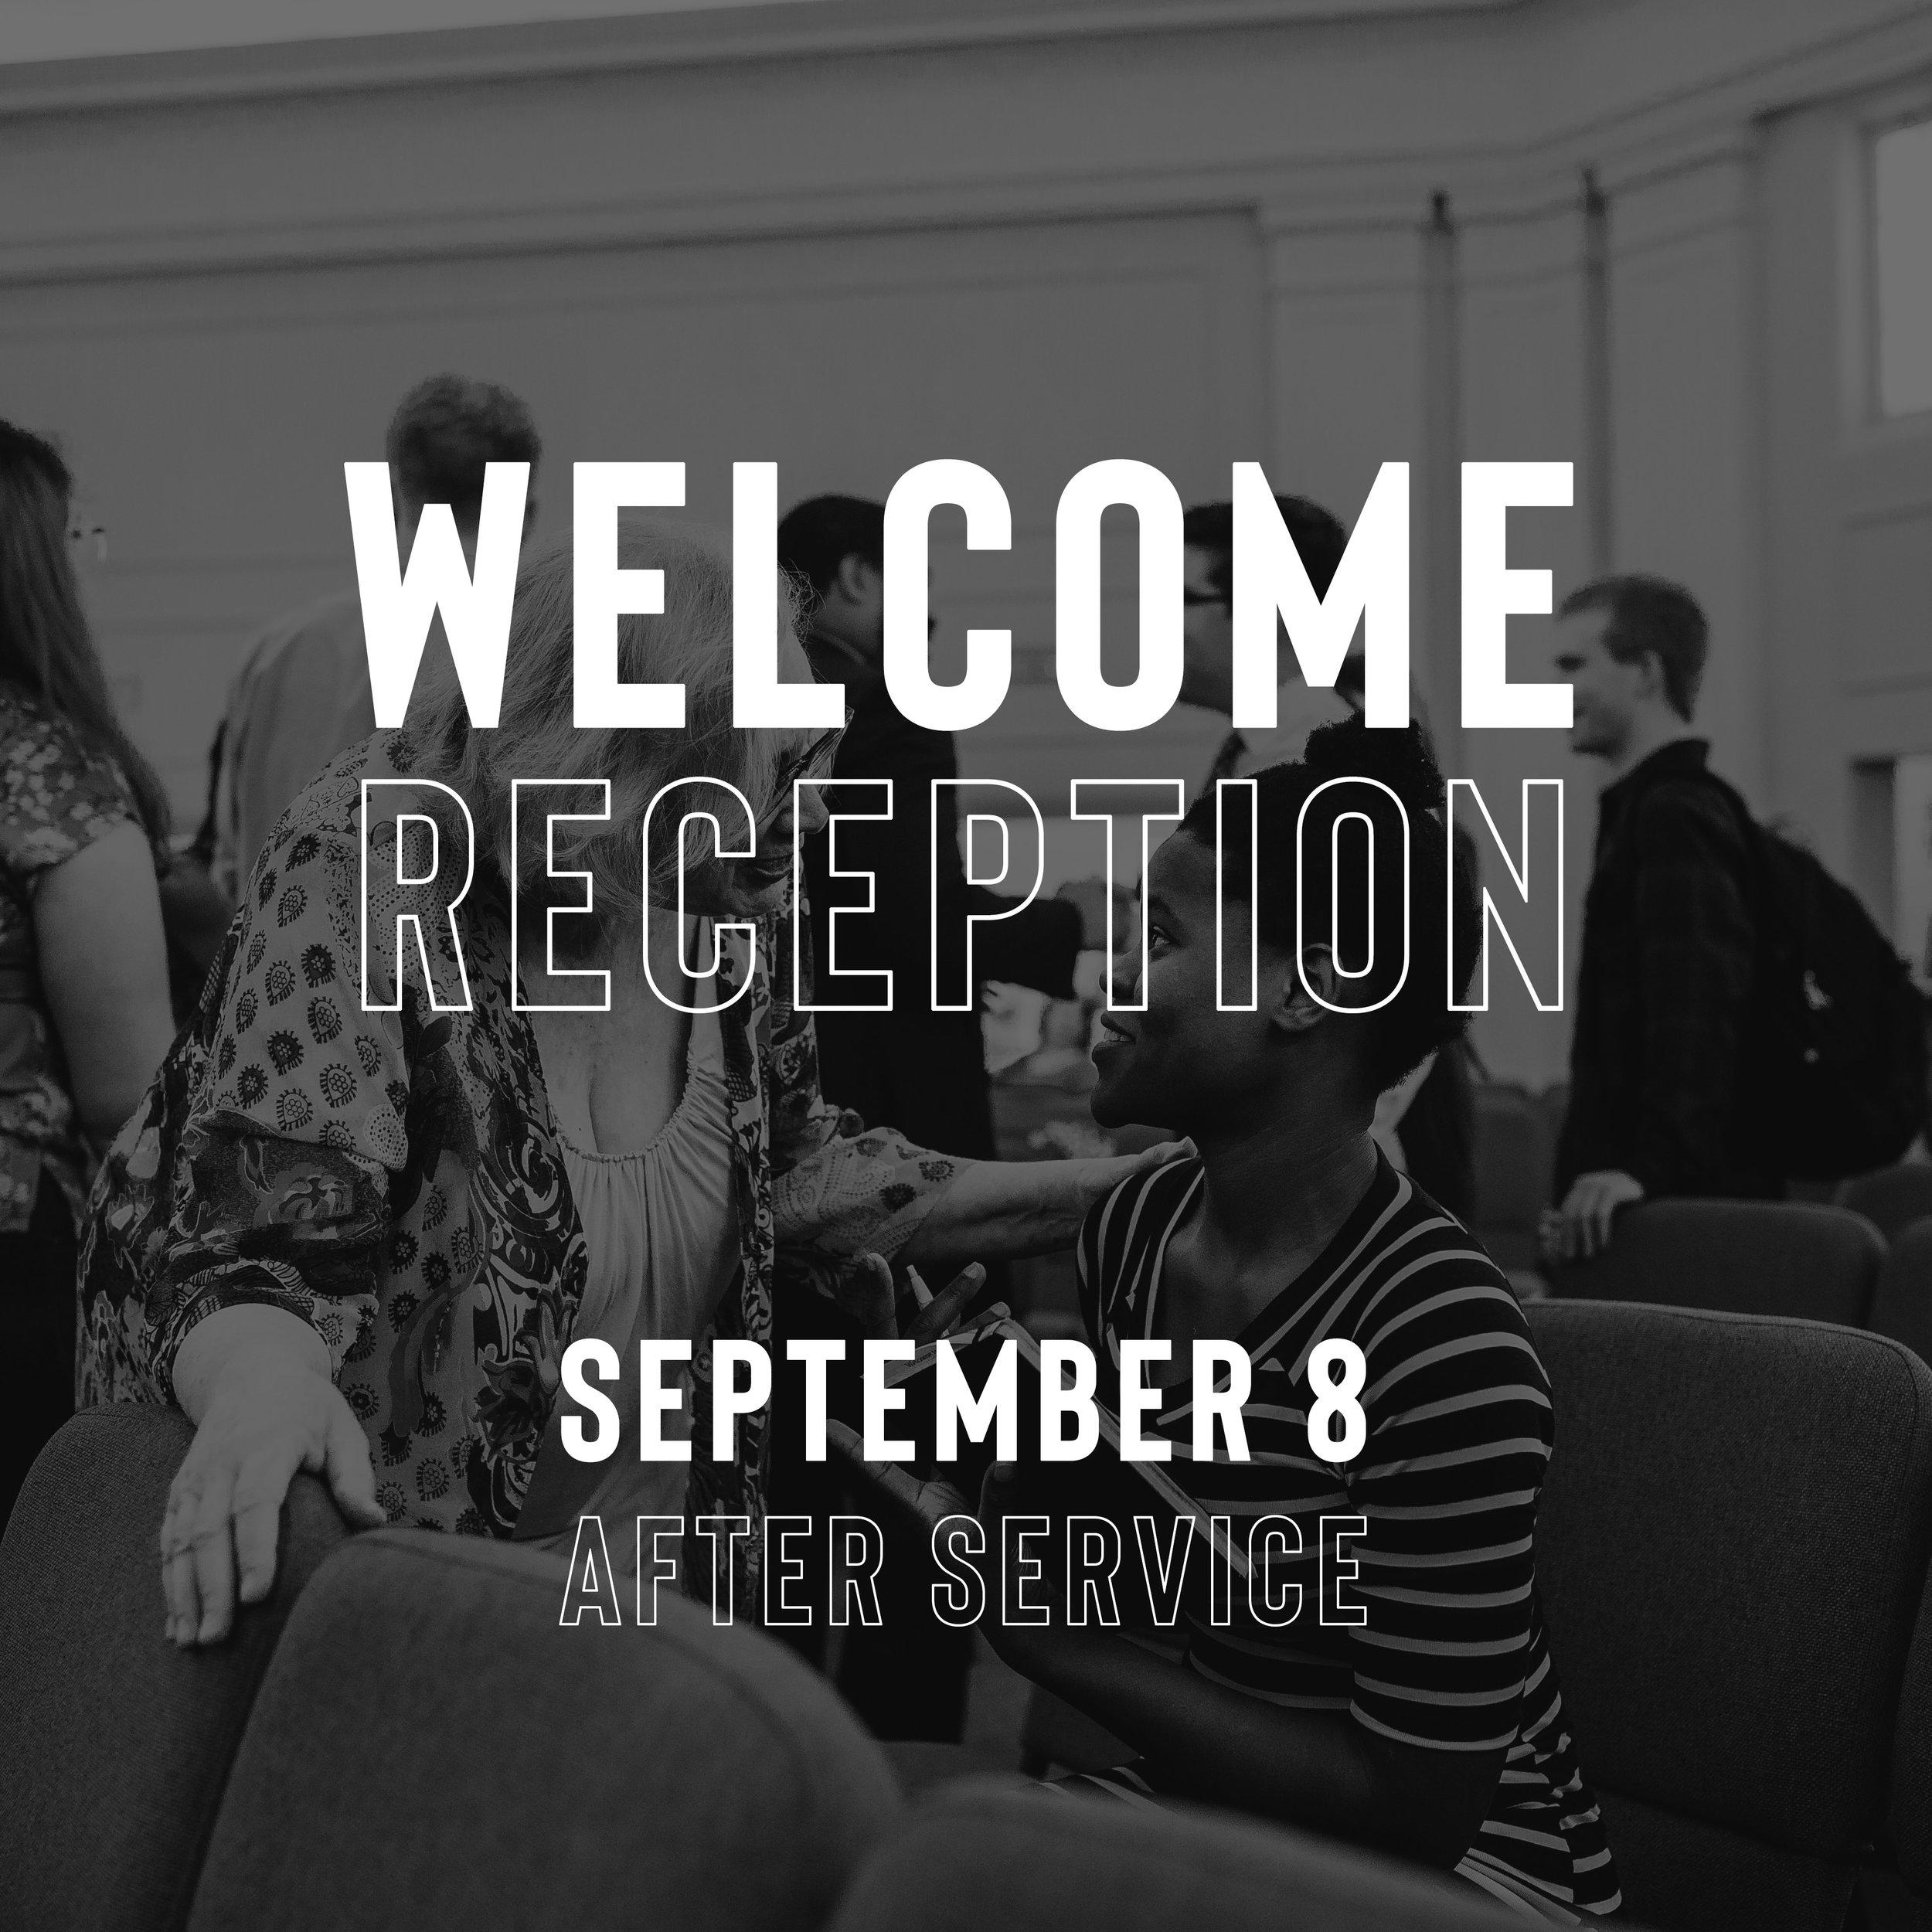 Welcome Reception Tile.jpg